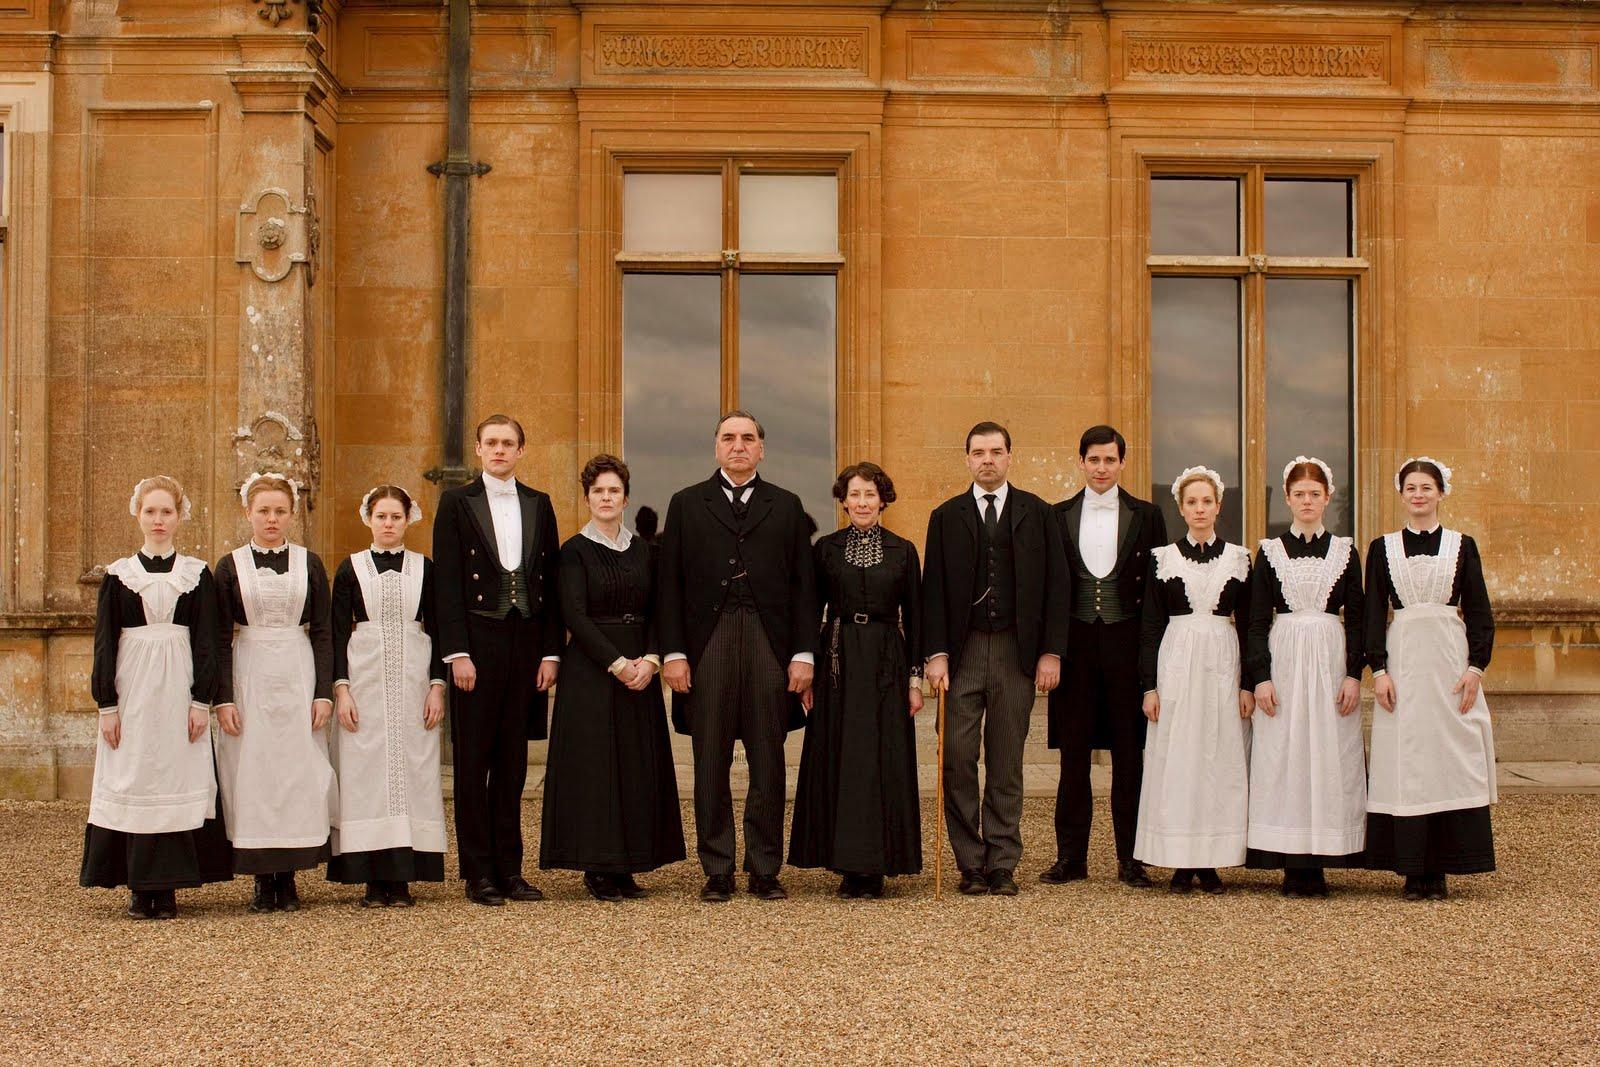 Downton abbey - Downton abbey histoire ...